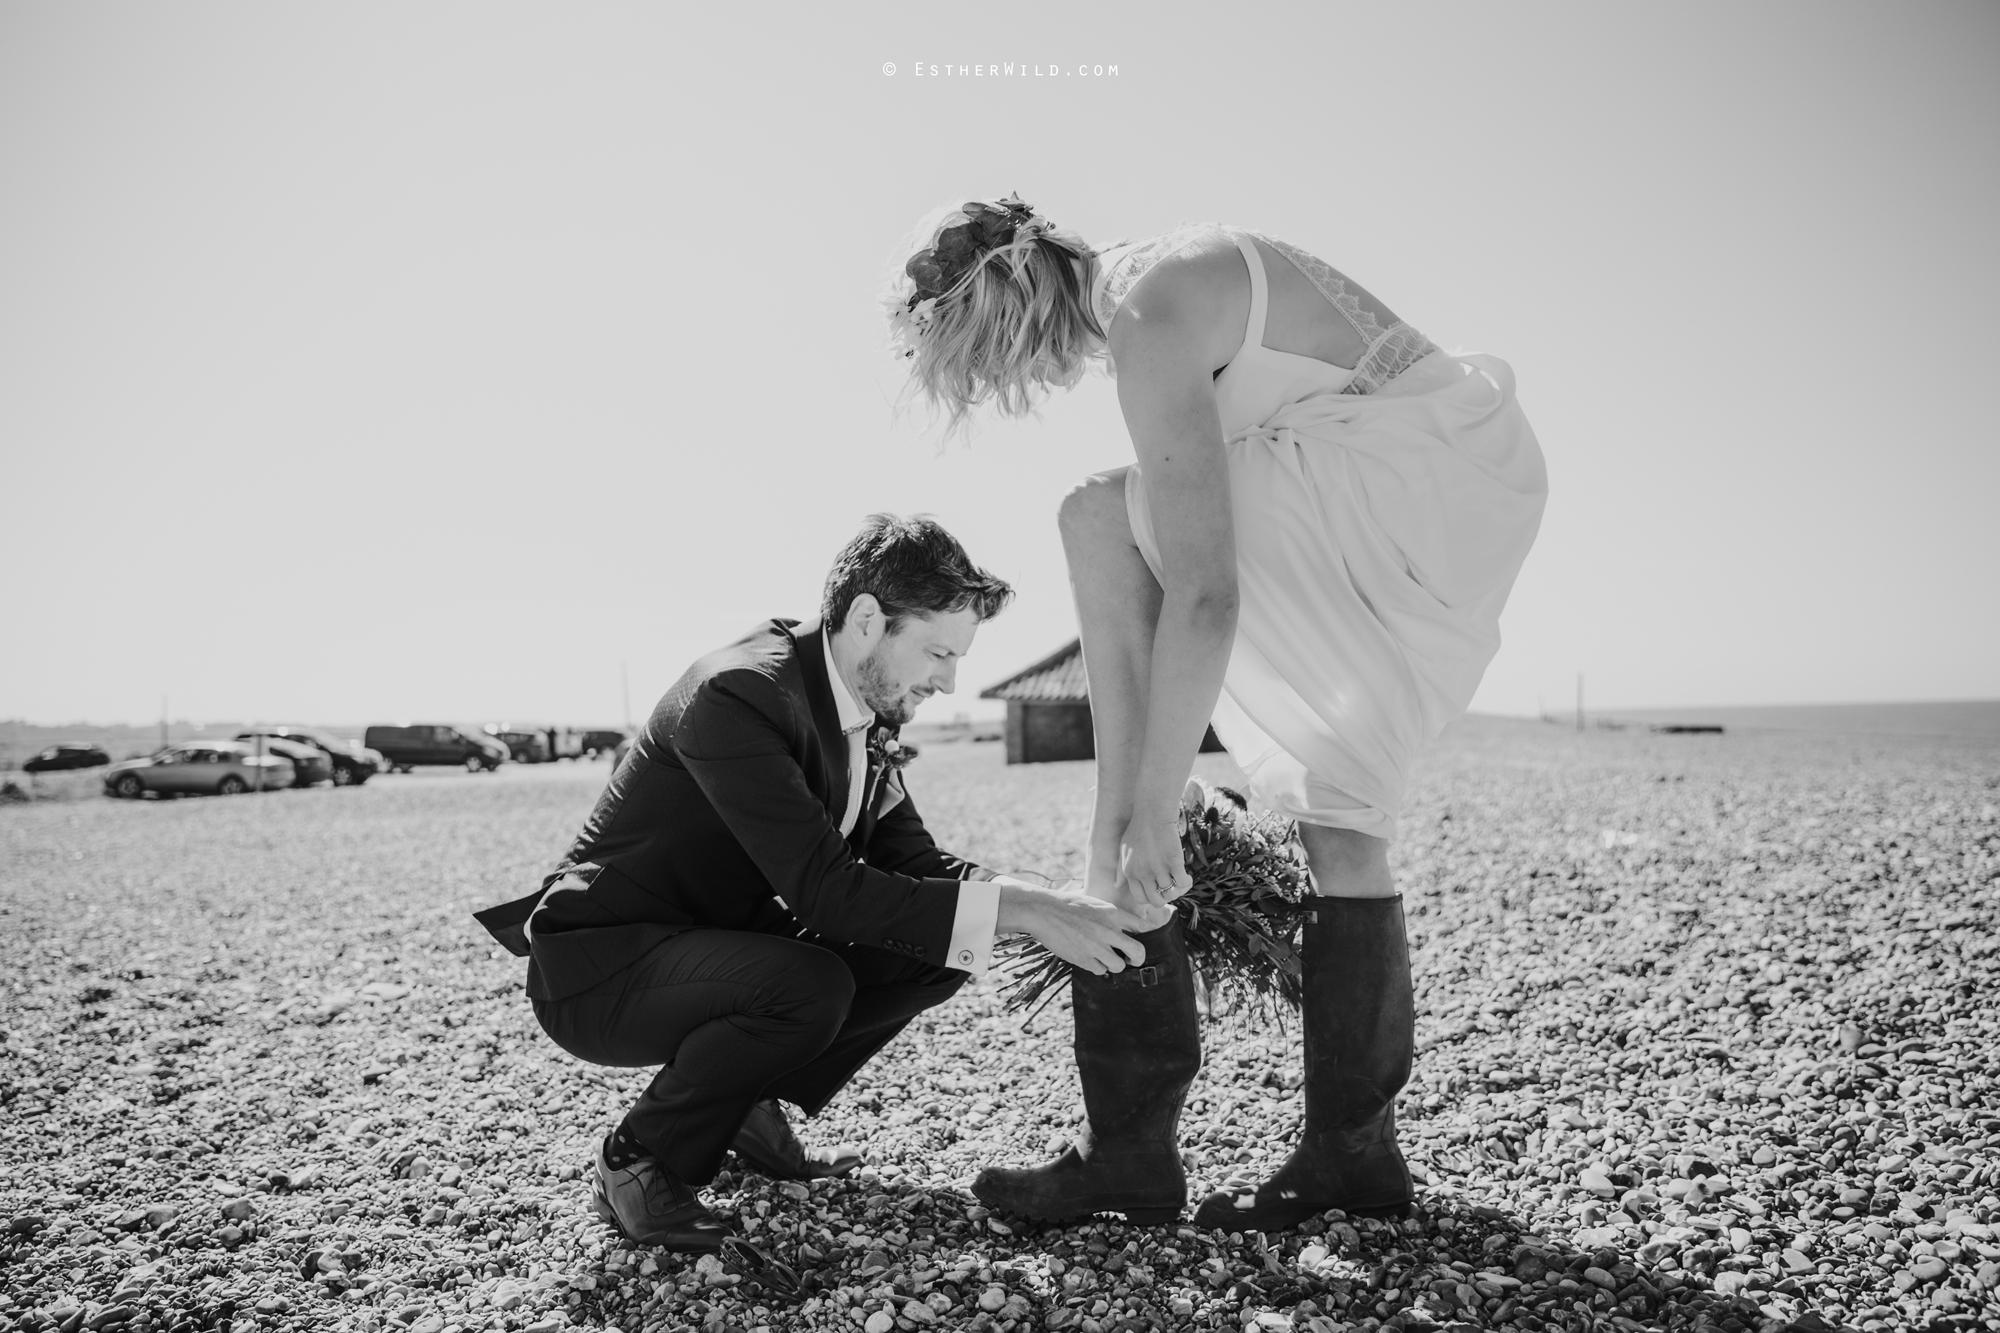 IMG_1338-2Cley_Barn_Drift_Norfolk_Coast_Wedding_Copyright_Esther_Wild_Photographer_.jpg